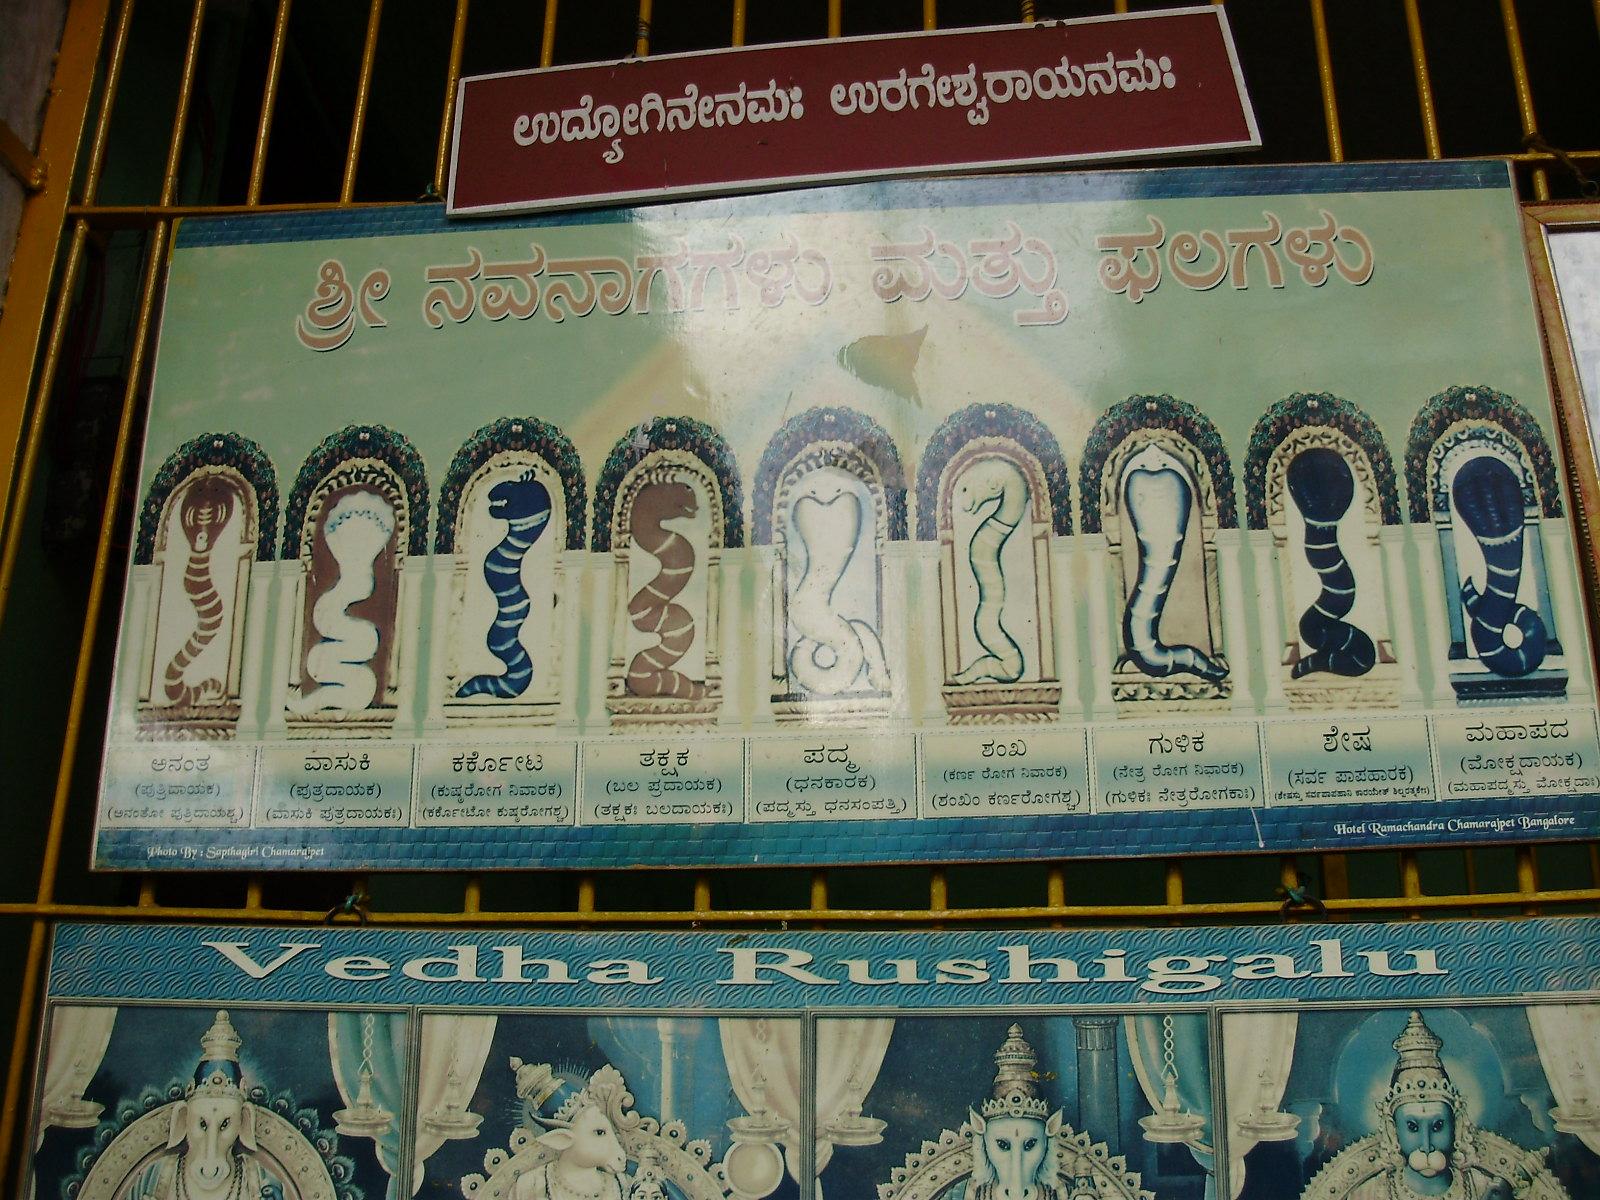 Helpful Tips on Sanatana Dharma / Hindu Principles - 66